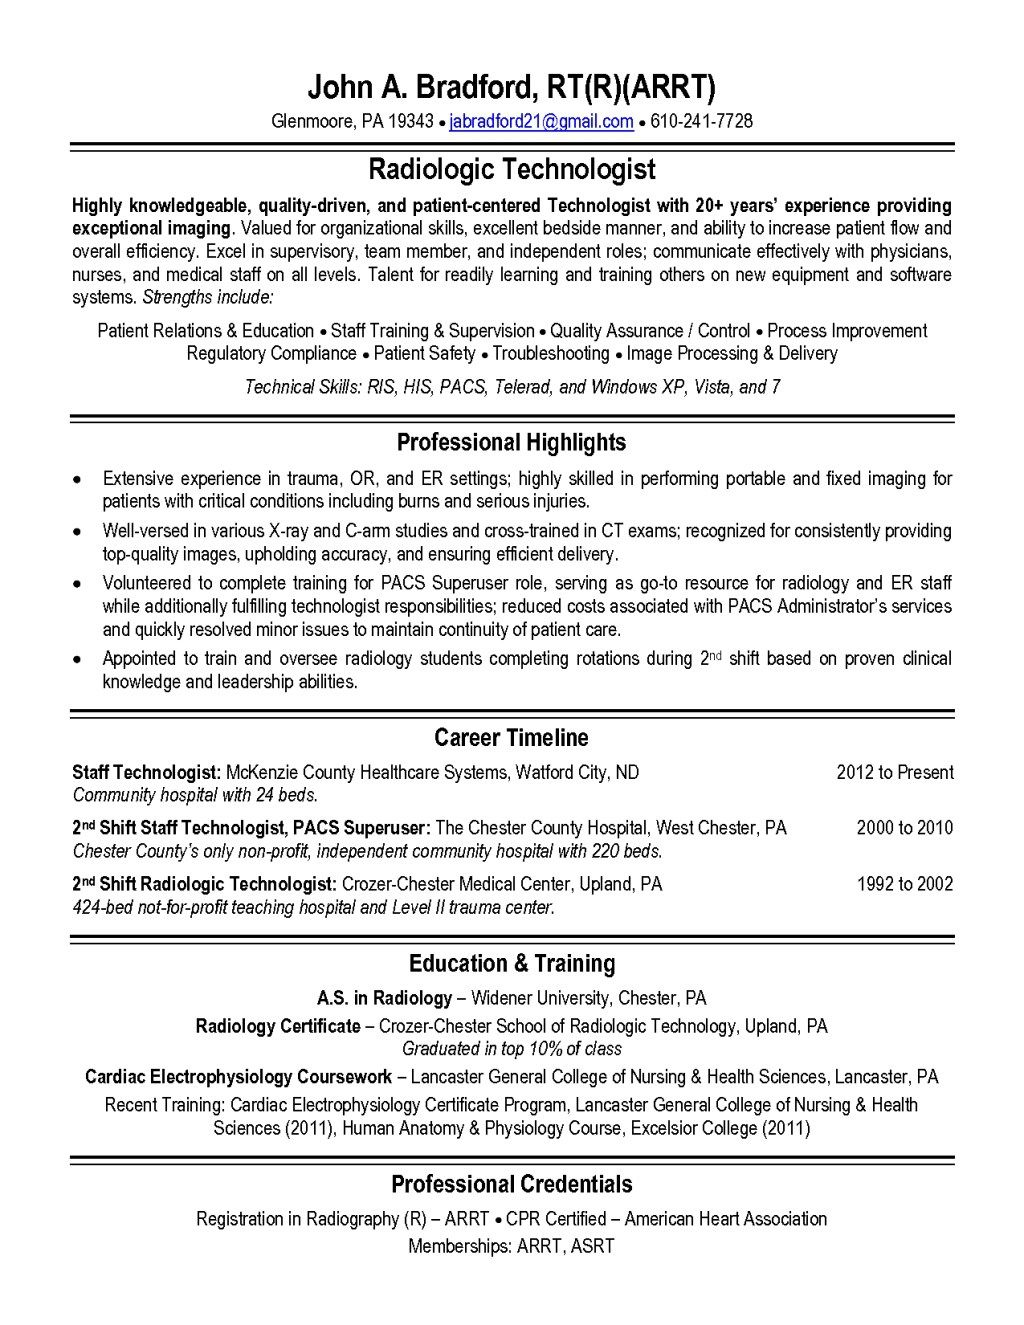 Radiology Administrator Sample Resume Manager Resumes Scheduler Compliance Auditor Radiologic Radiology Technologist Professional Resume Examples Resume Skills